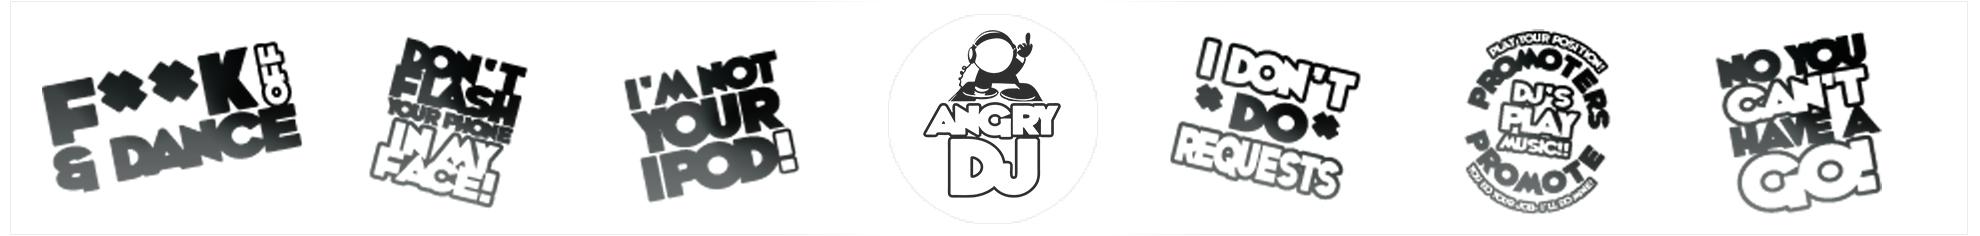 angry dj logo collections